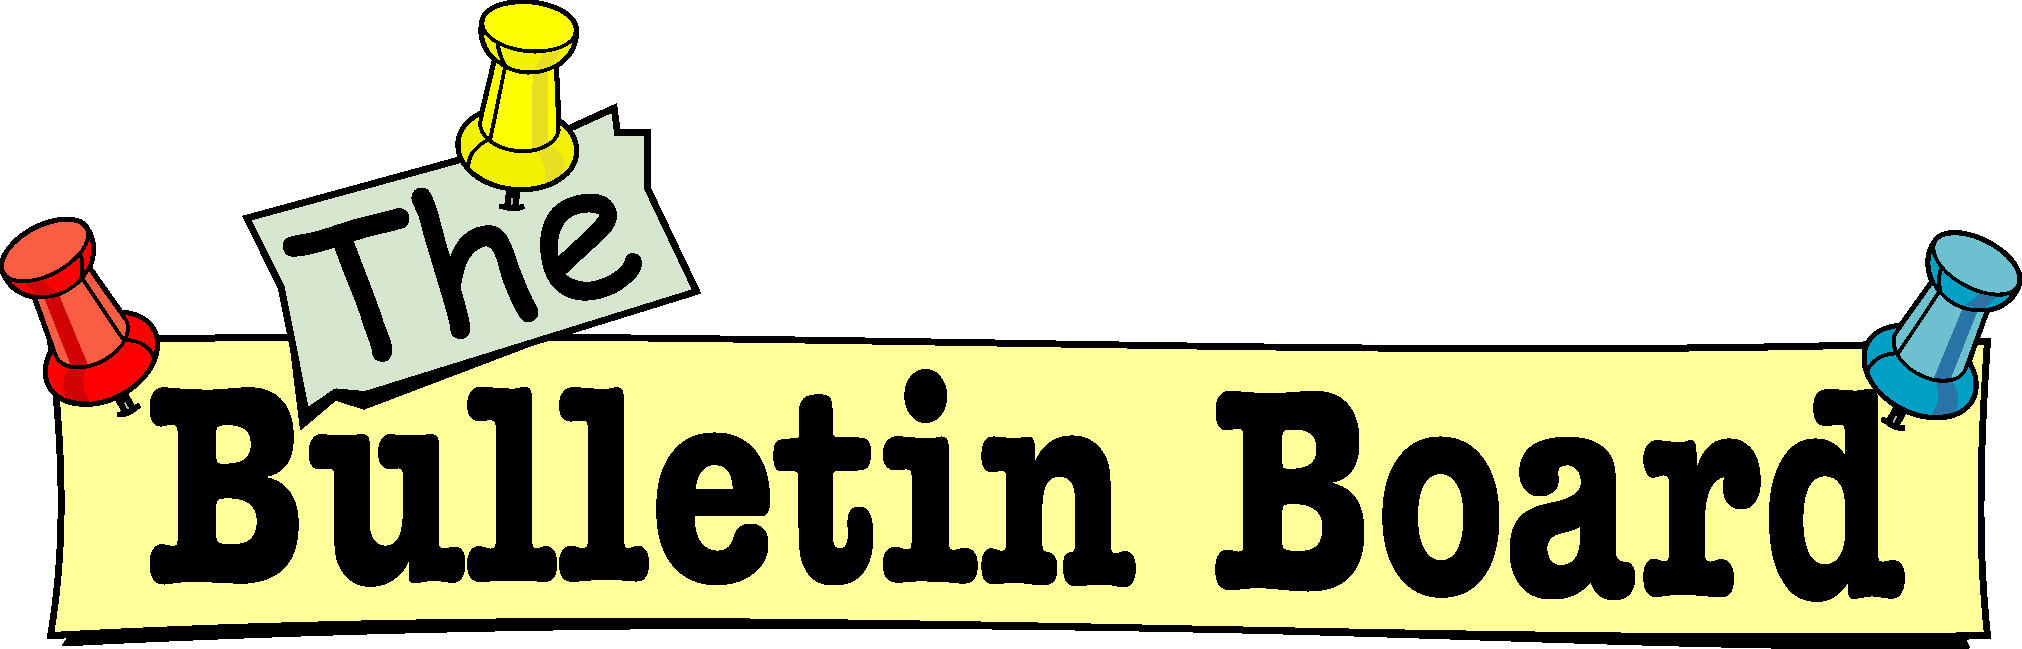 news bulletin clipart-news bulletin clipart-15